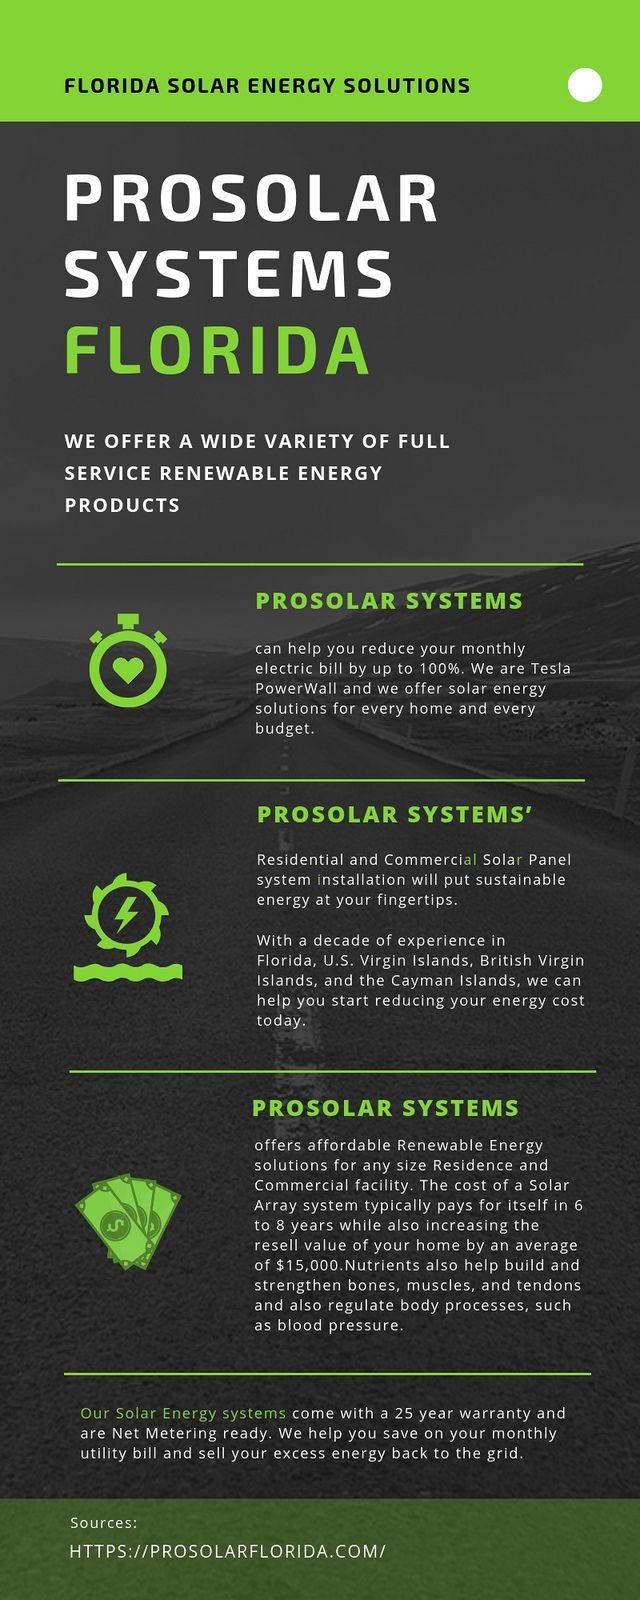 Prosolar Systems Florida Solar Energy Solutions Energy Providers Solar Energy System